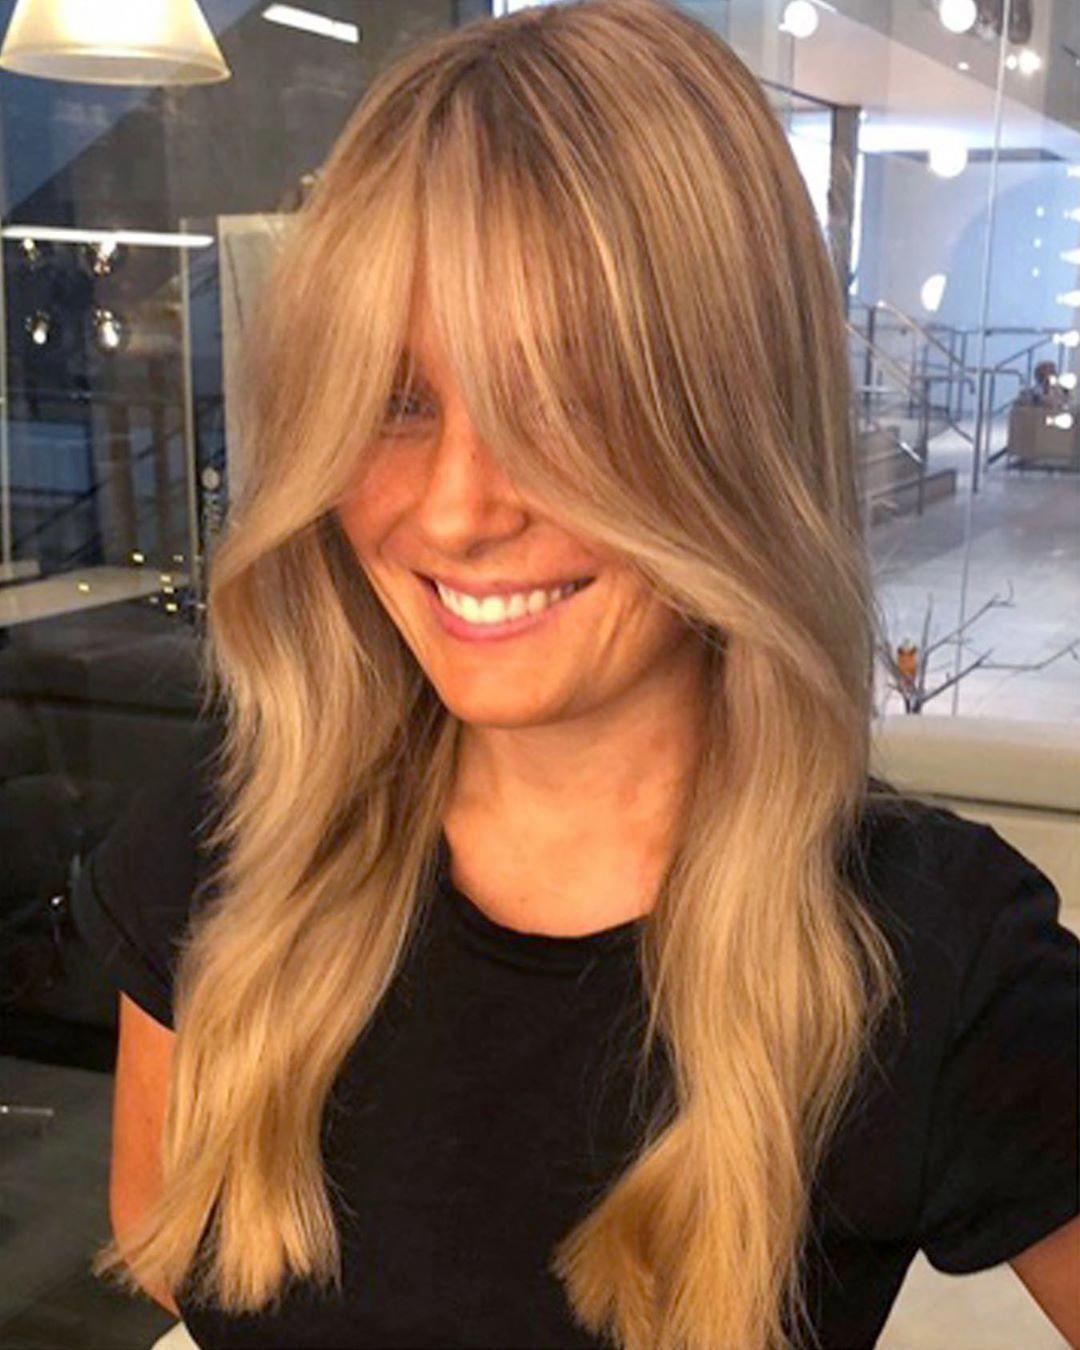 Perth Hair Salon On Instagram Curtain Fringe Realness Loving This Look By Sarahgabriella Mauricemeade For In 2020 Fringe Haircut Long Hair Styles Long Thin Hair